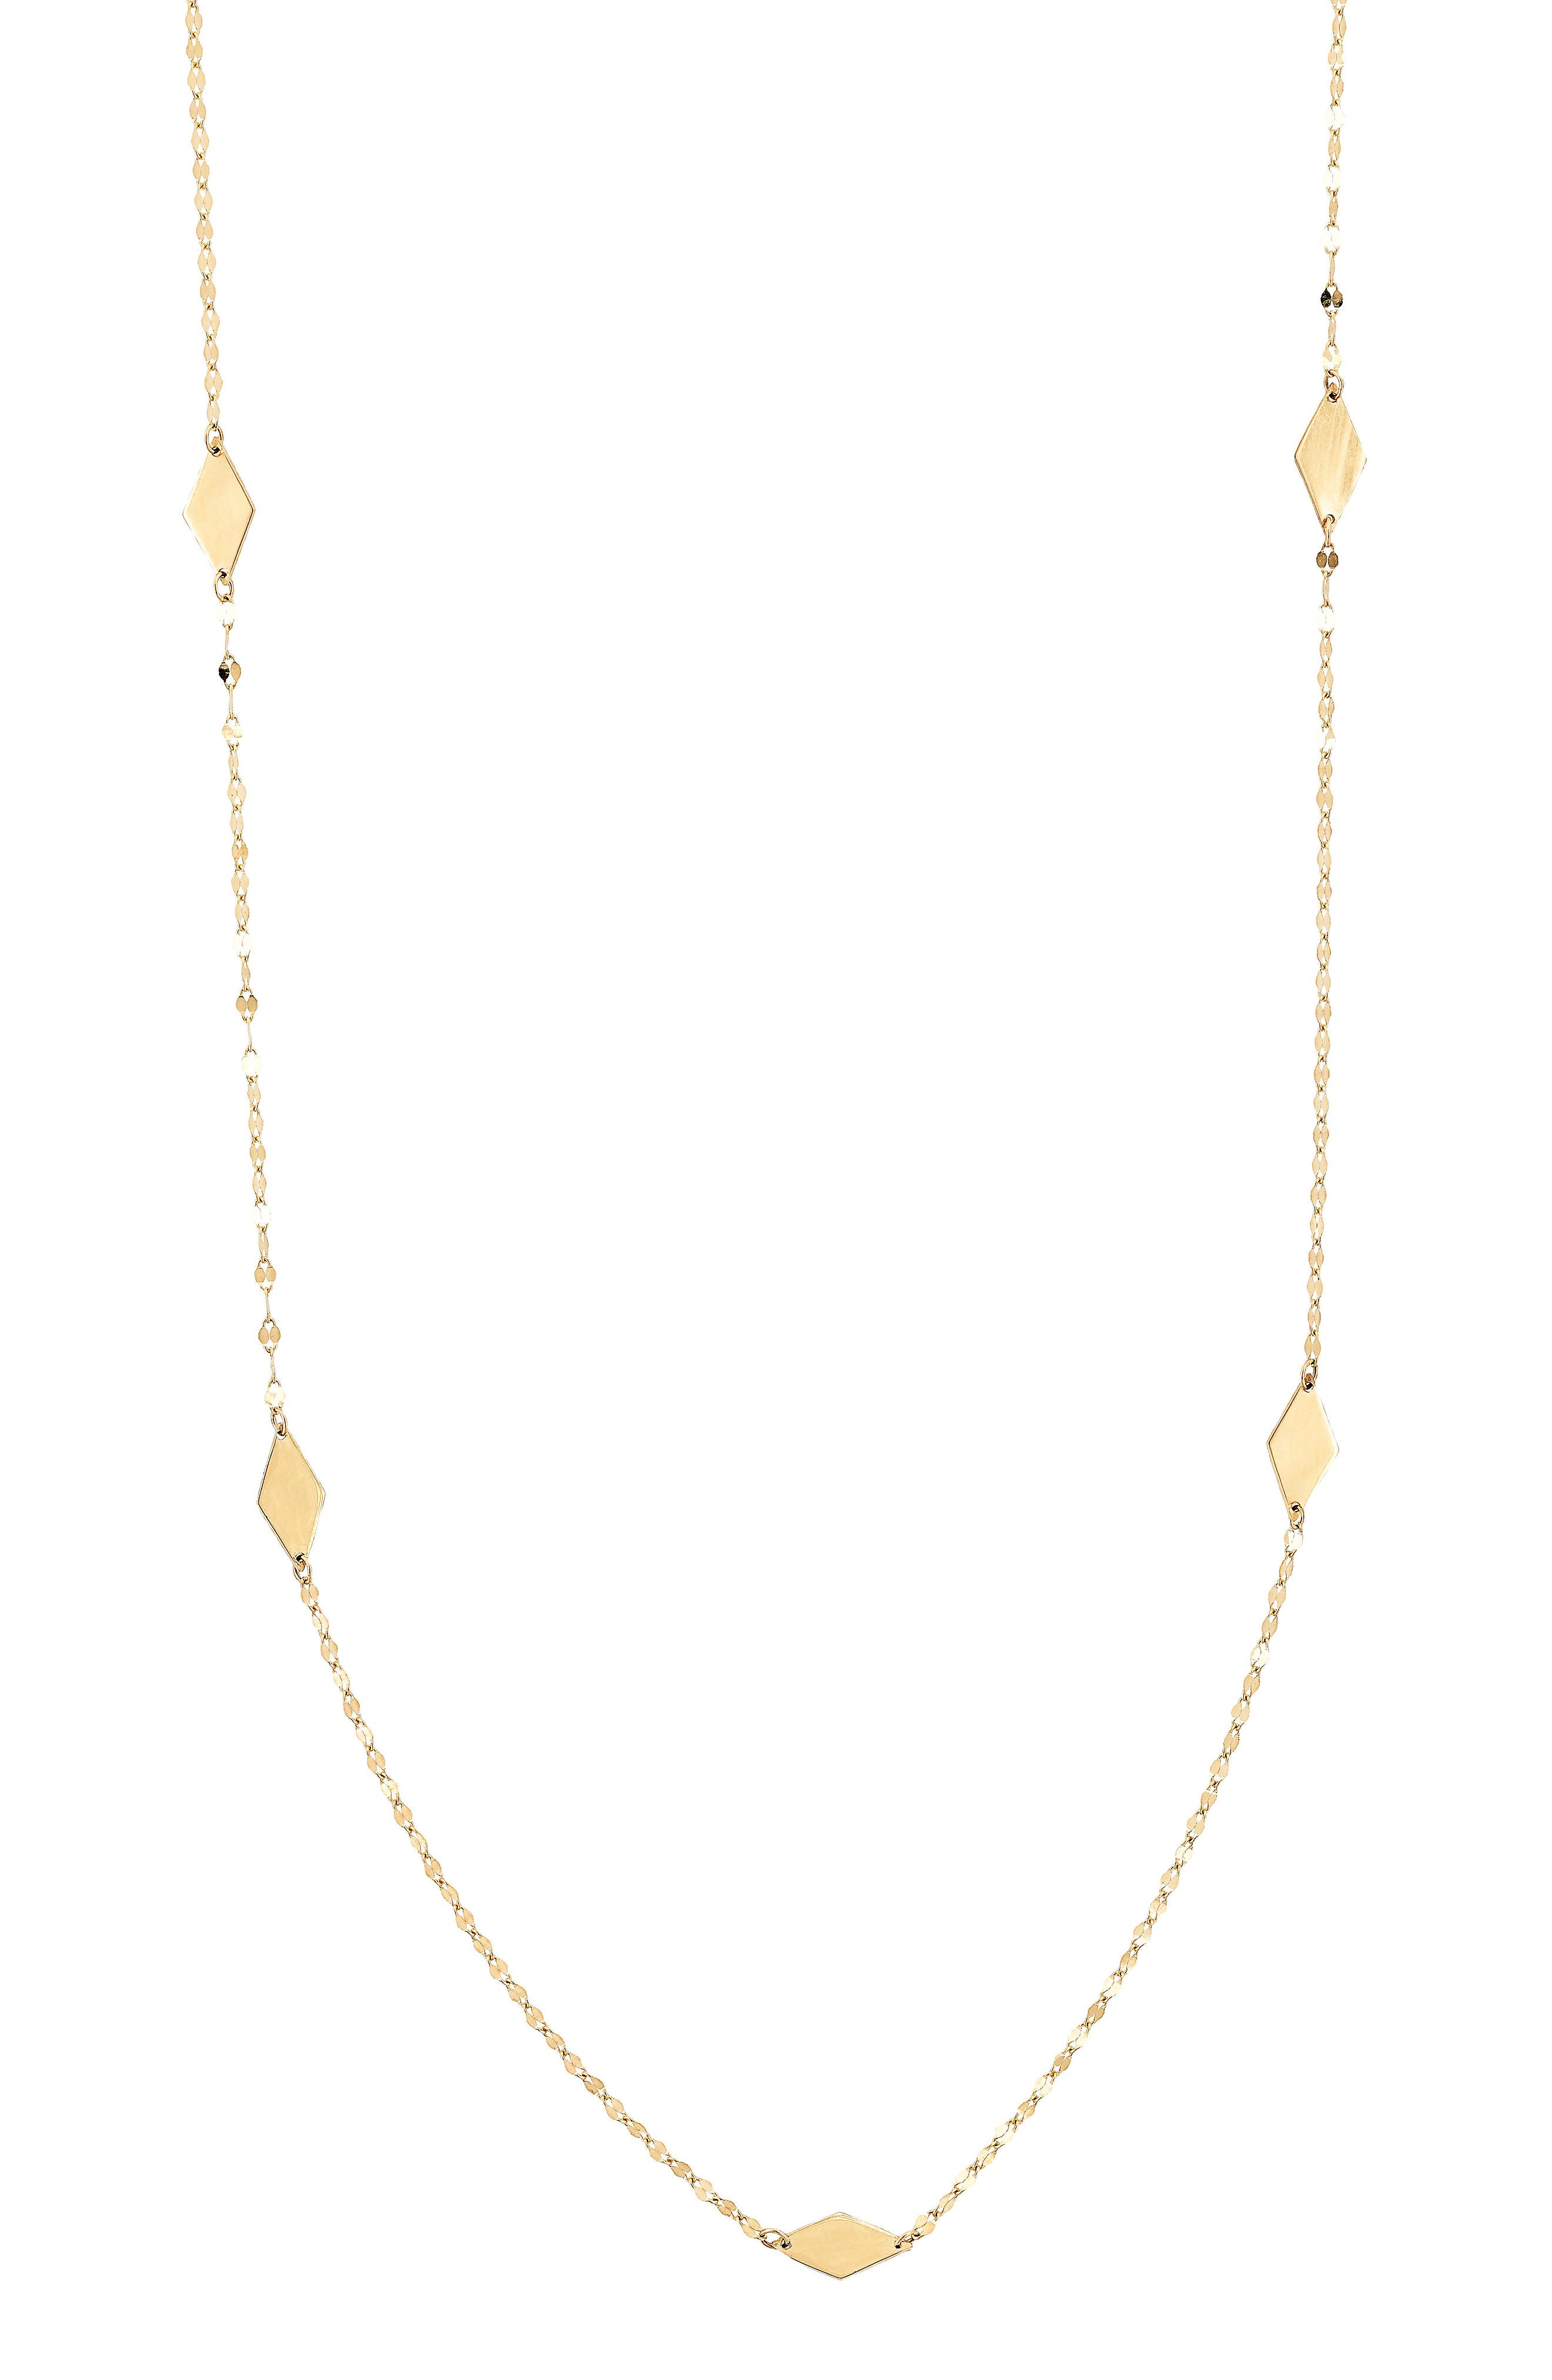 Lana Jewelry Kite Station Necklace